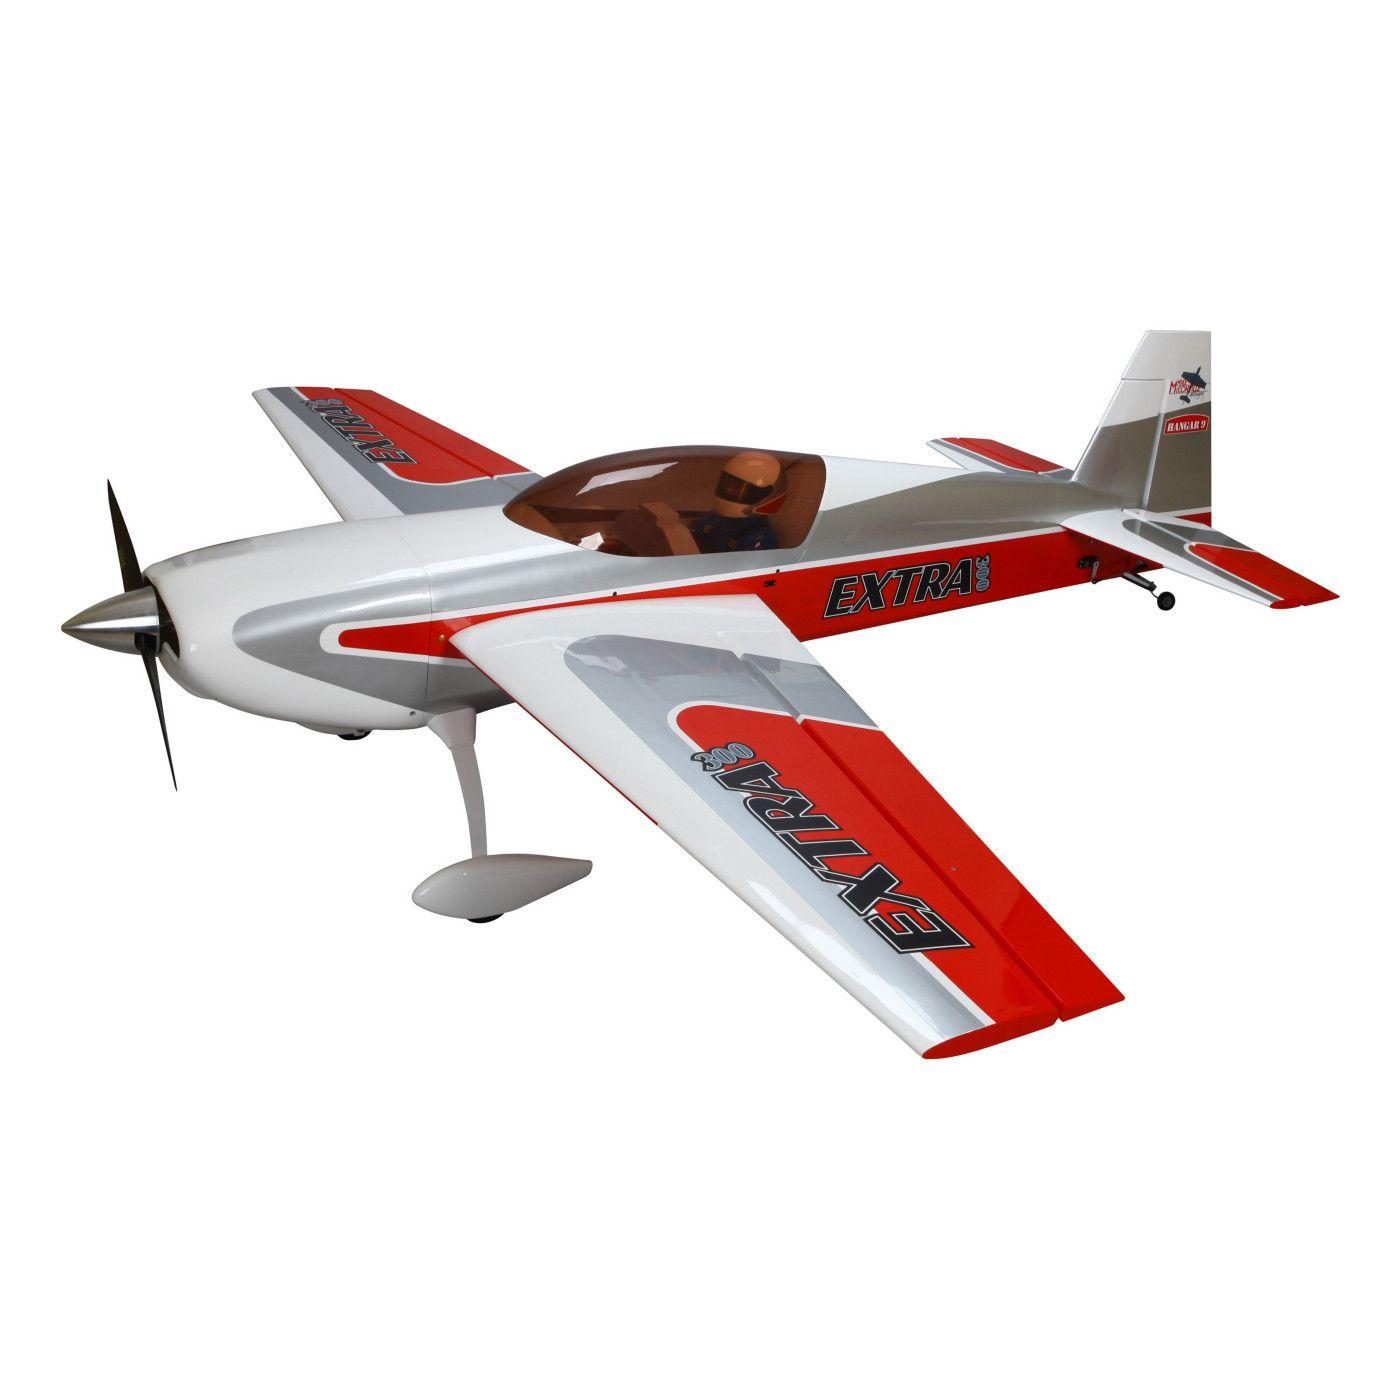 Hangar 9 35 Extra 300 Airplane Arf 3 Boxes Horizon Hobby